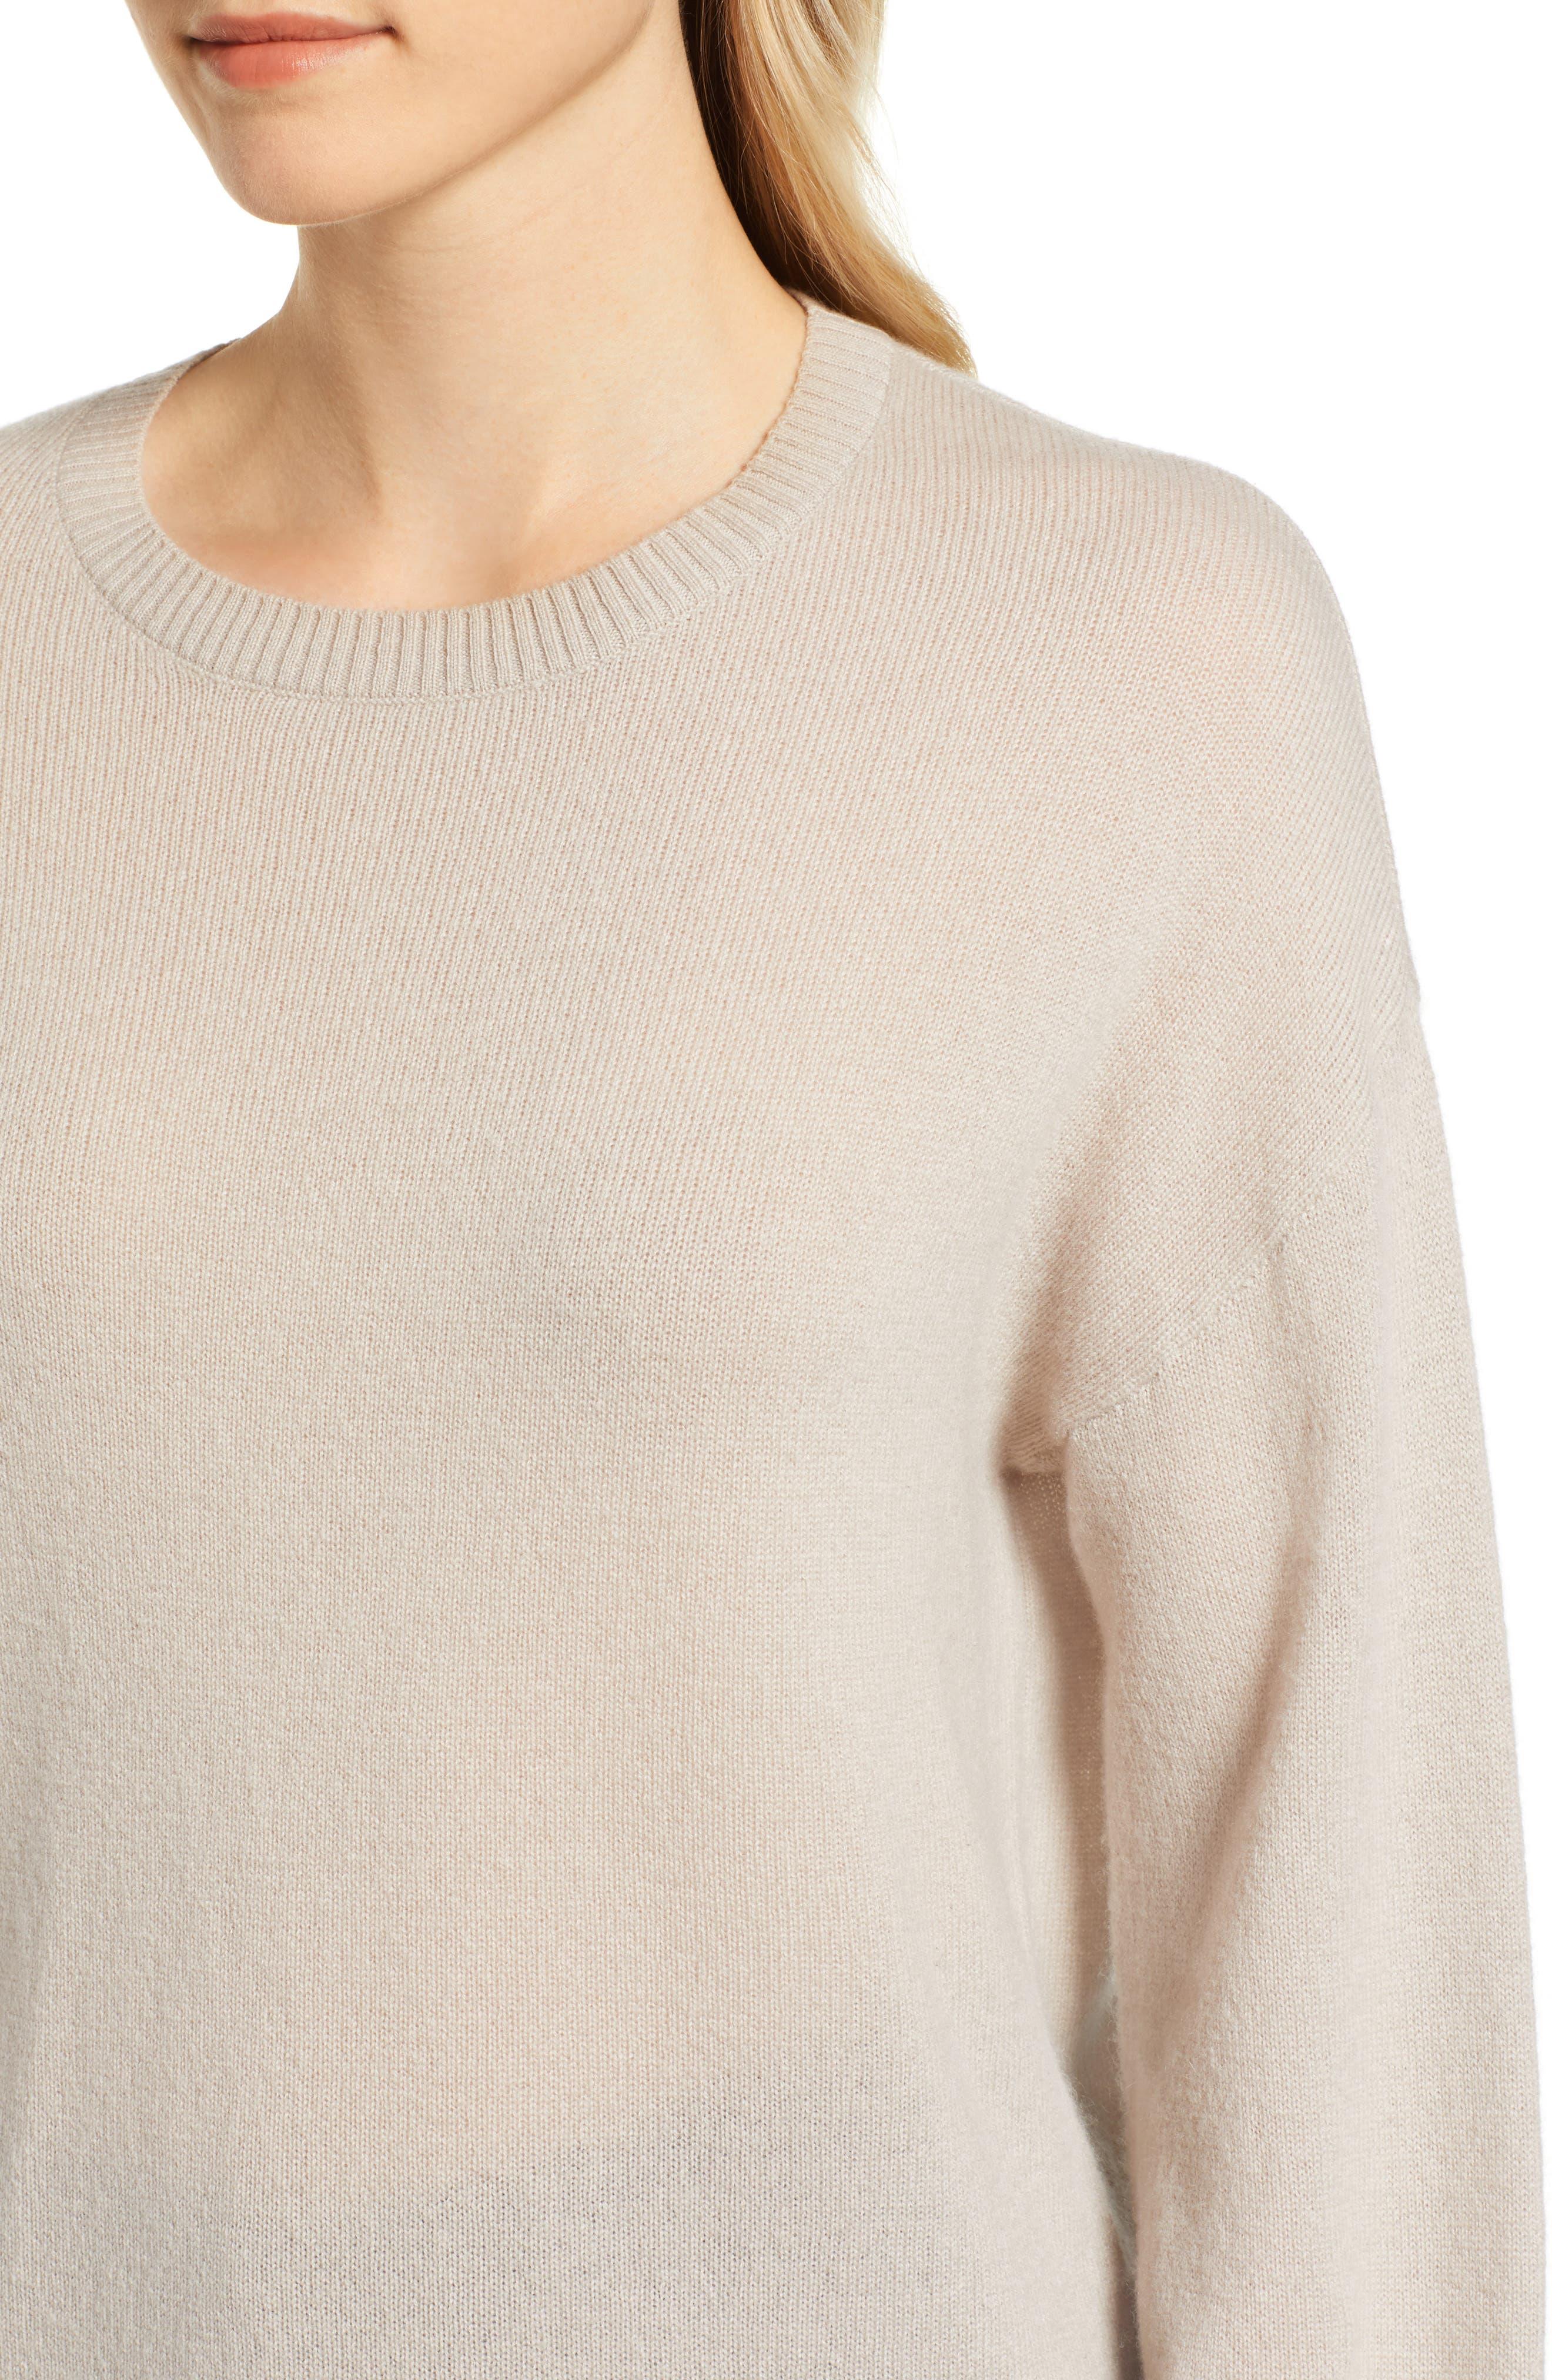 Blouson Sleeve Cashmere Sweater,                             Alternate thumbnail 4, color,                             MUSHROOM